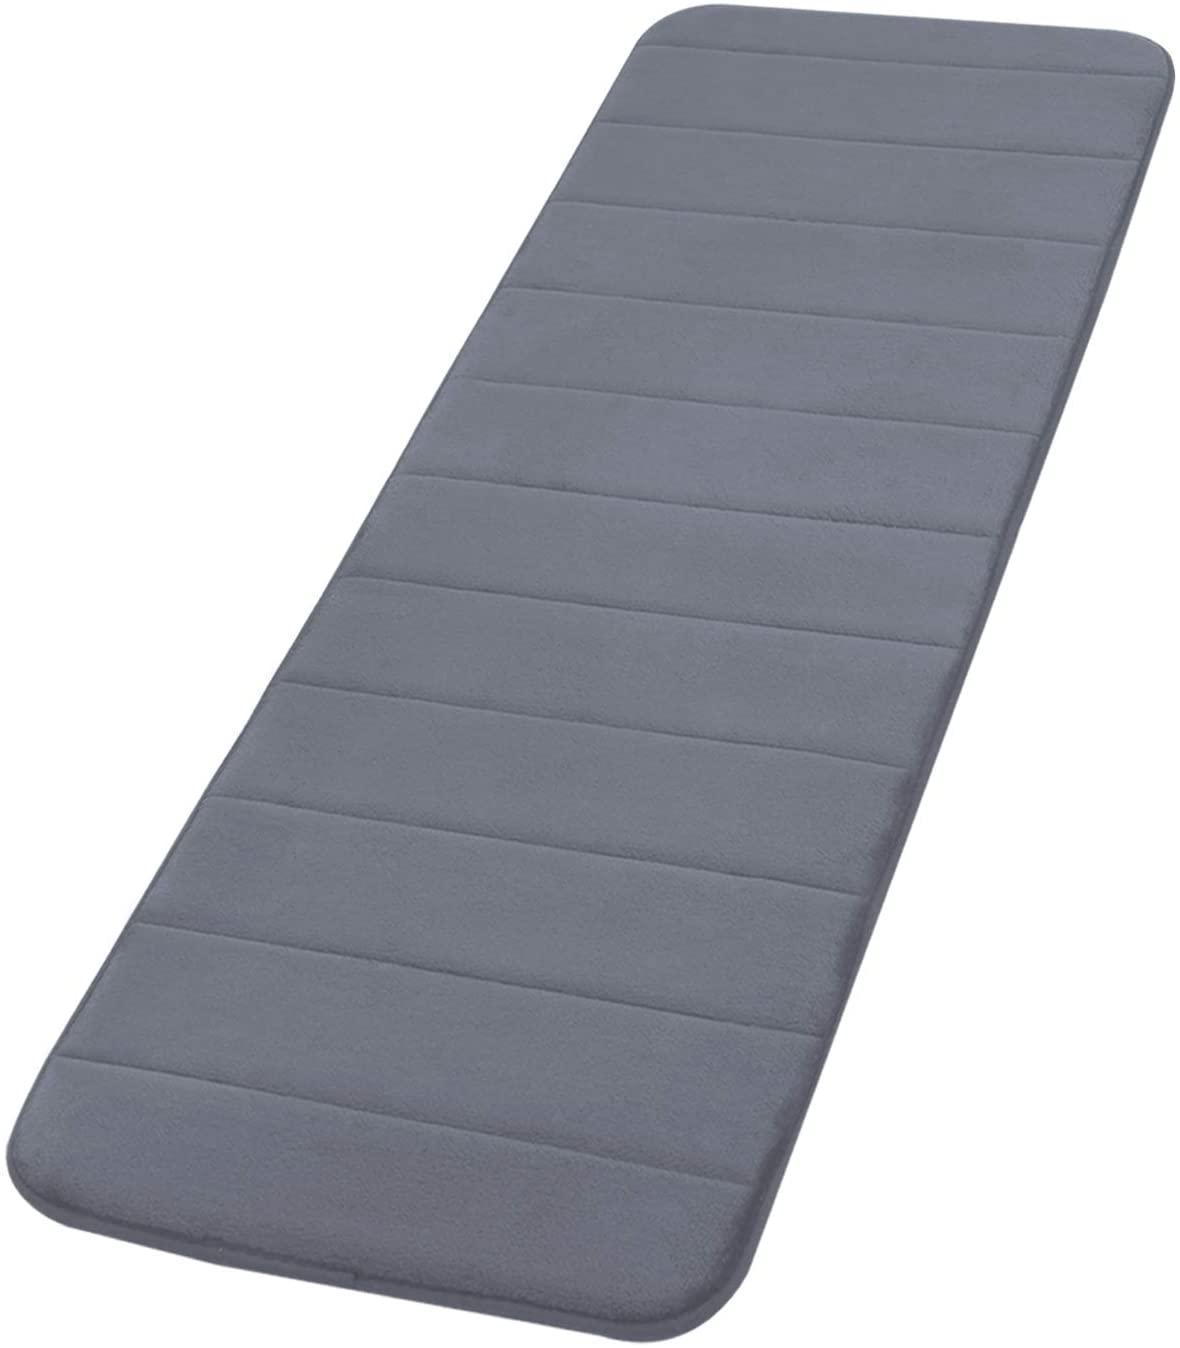 AOACreations Non Slip Soft Memory Foam Bathroom Runner Rug Mat Striped for Bath Kitchen (47